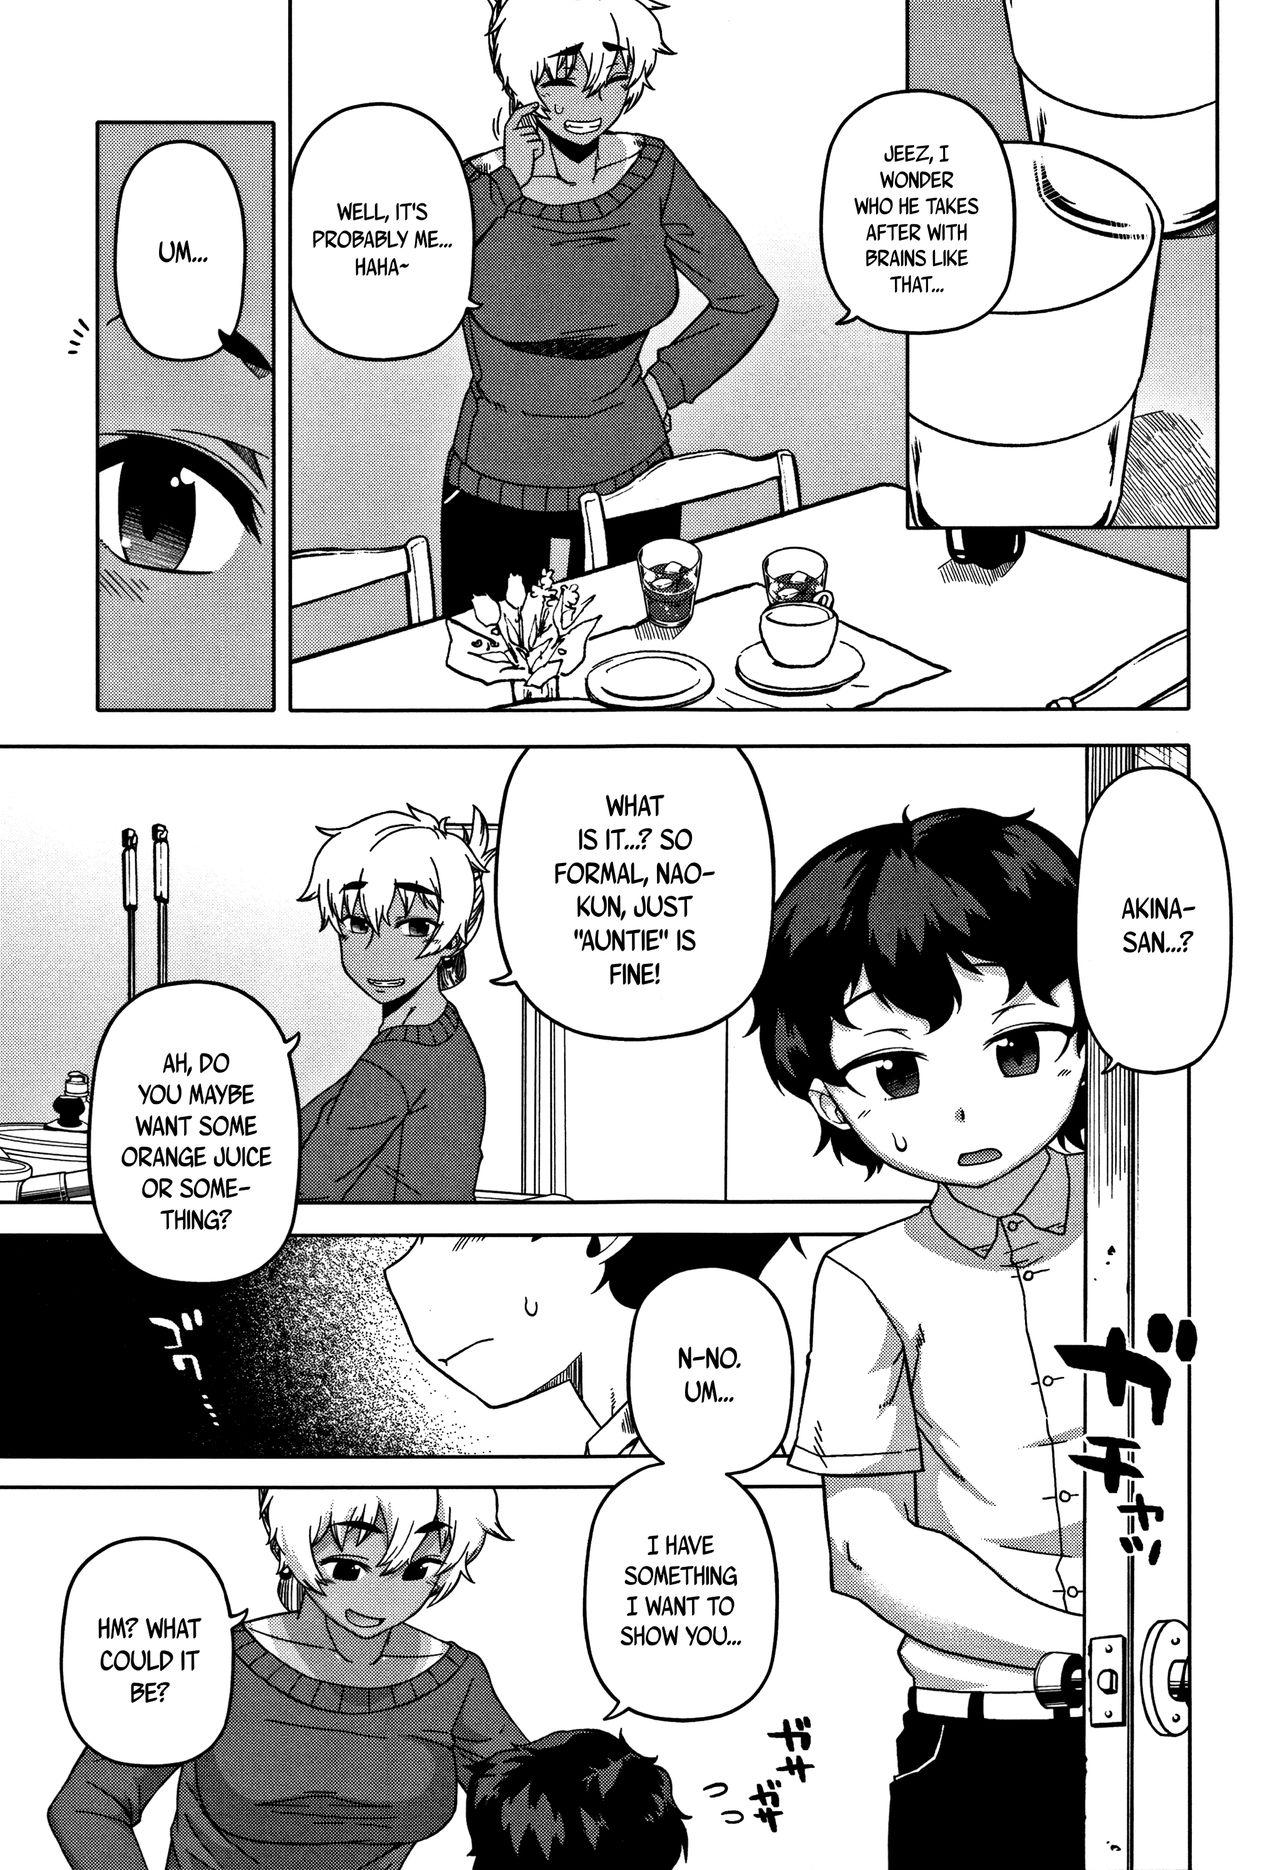 [Takatsu] Hitozuma A-san to Musuko no Yuujin N-kun - Married wife A and son's friend N-kun [English] 10